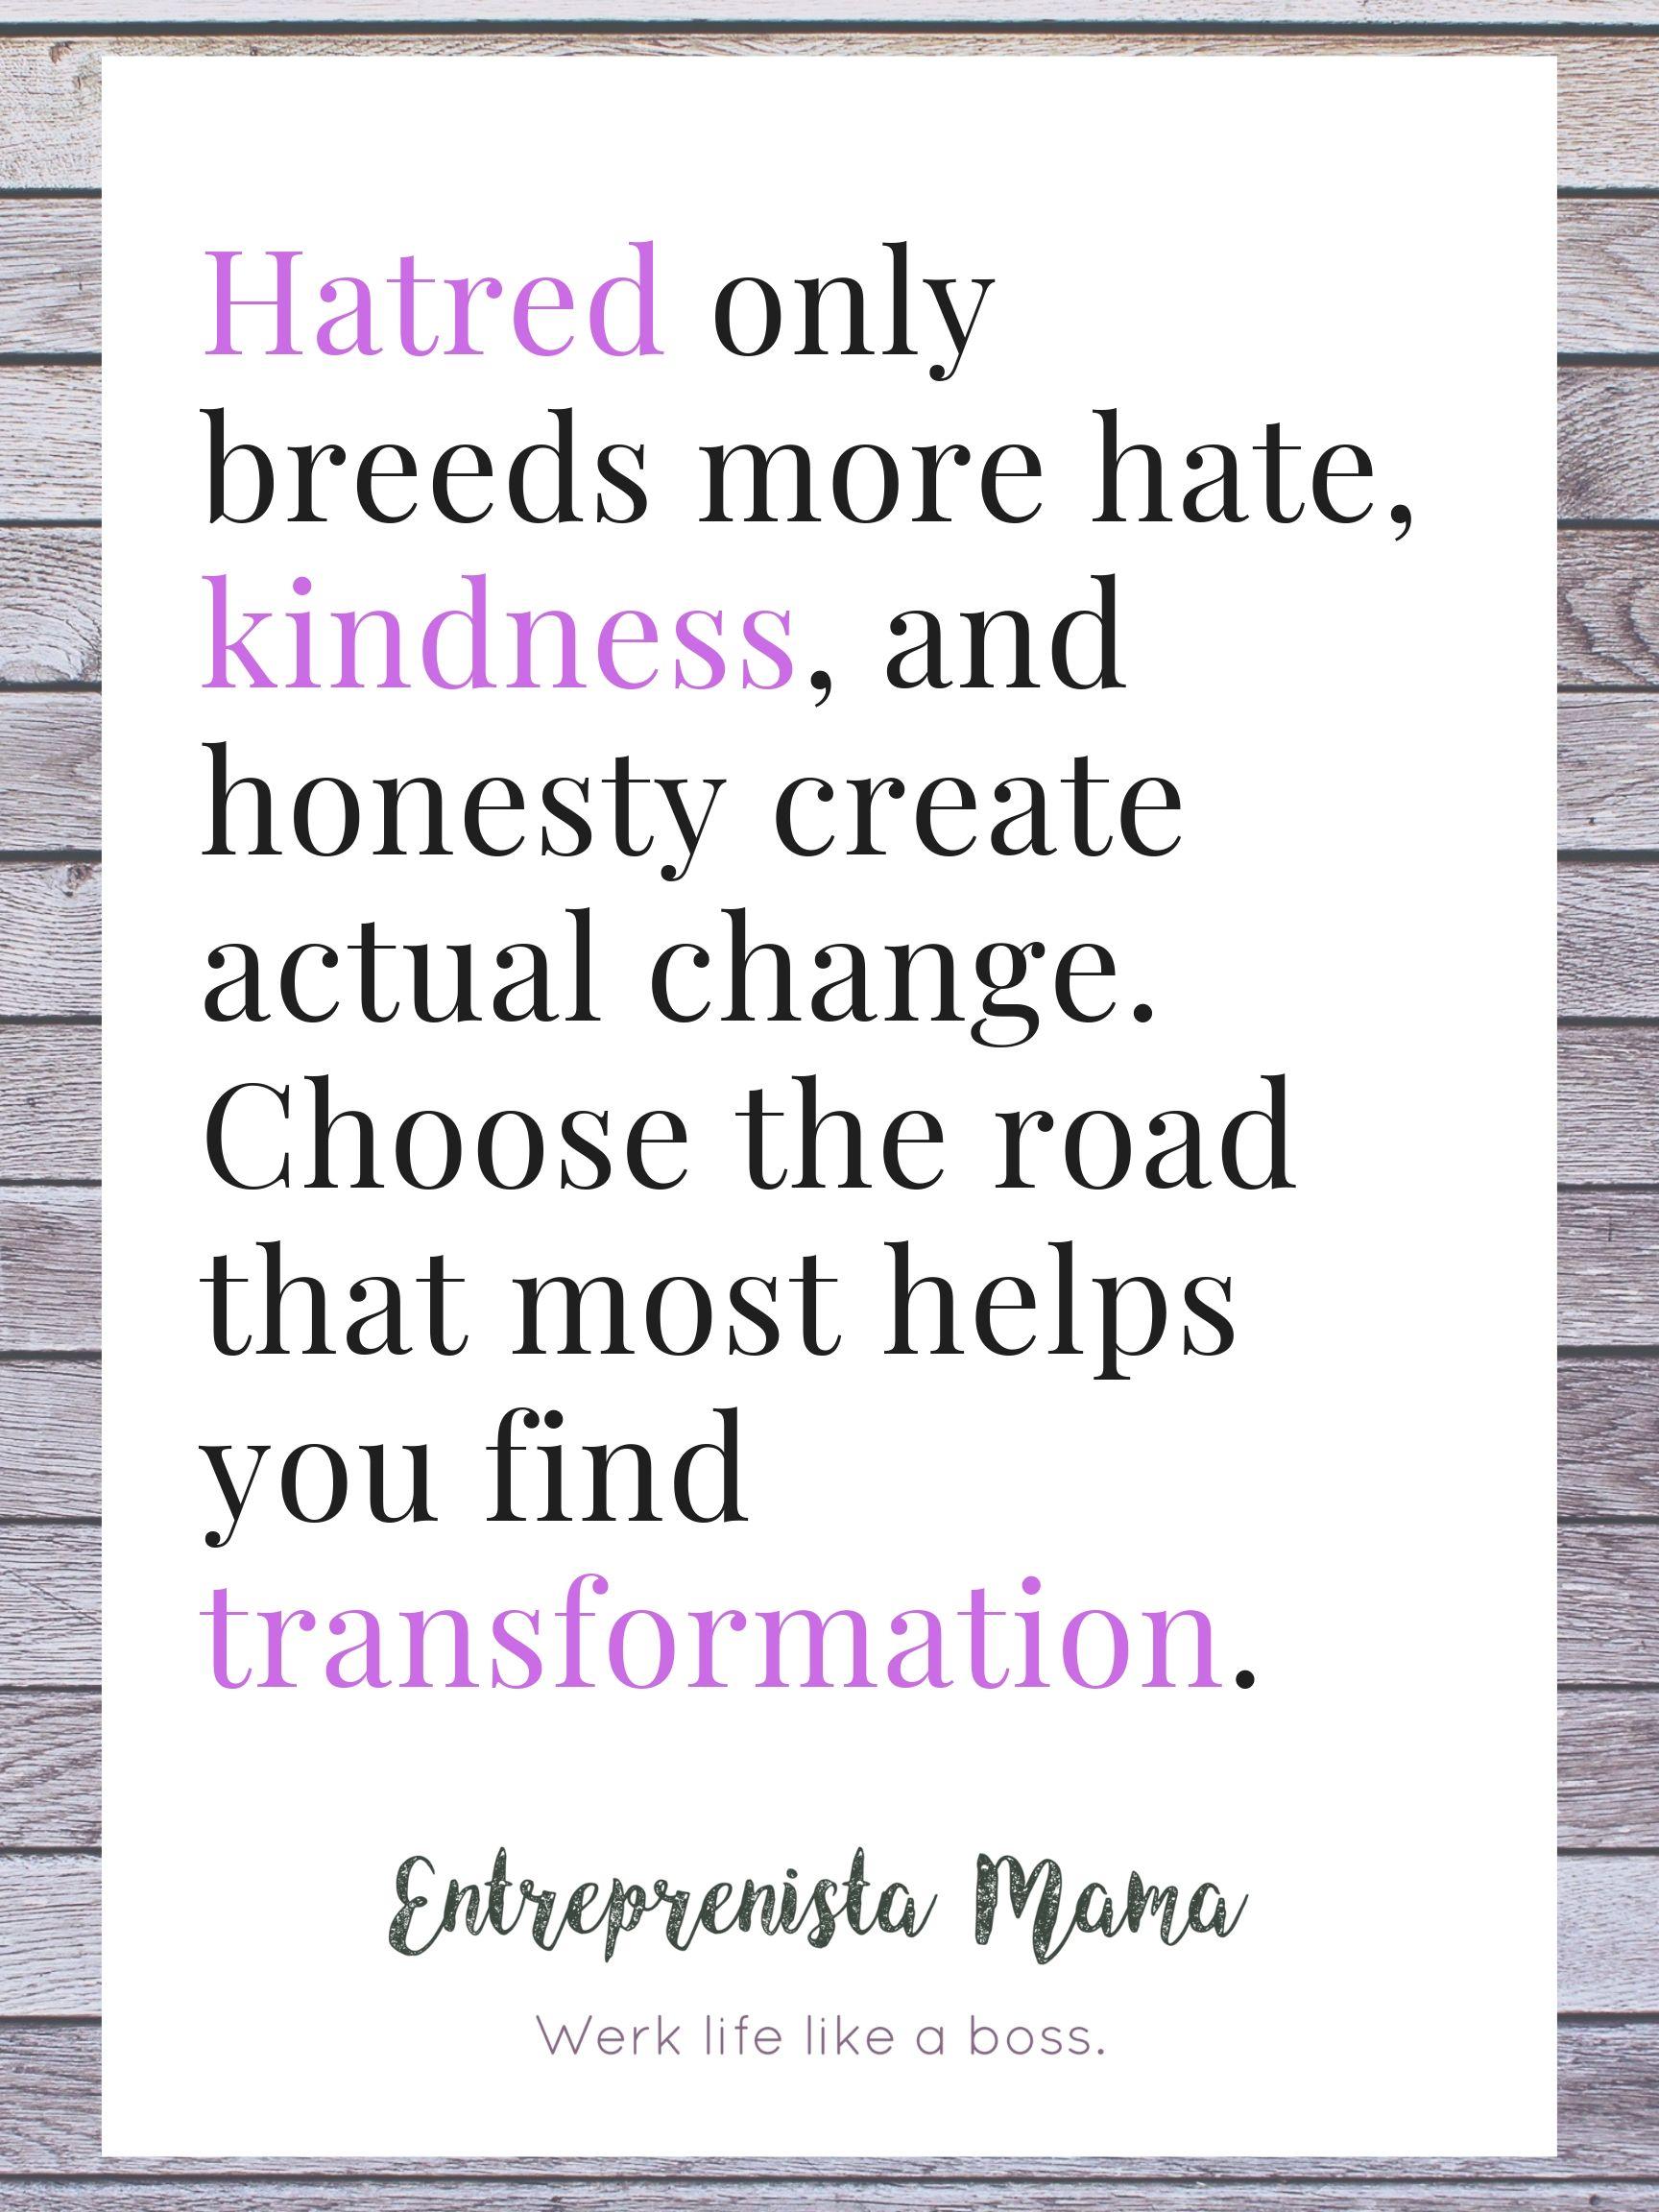 Seek Transformation not hatred